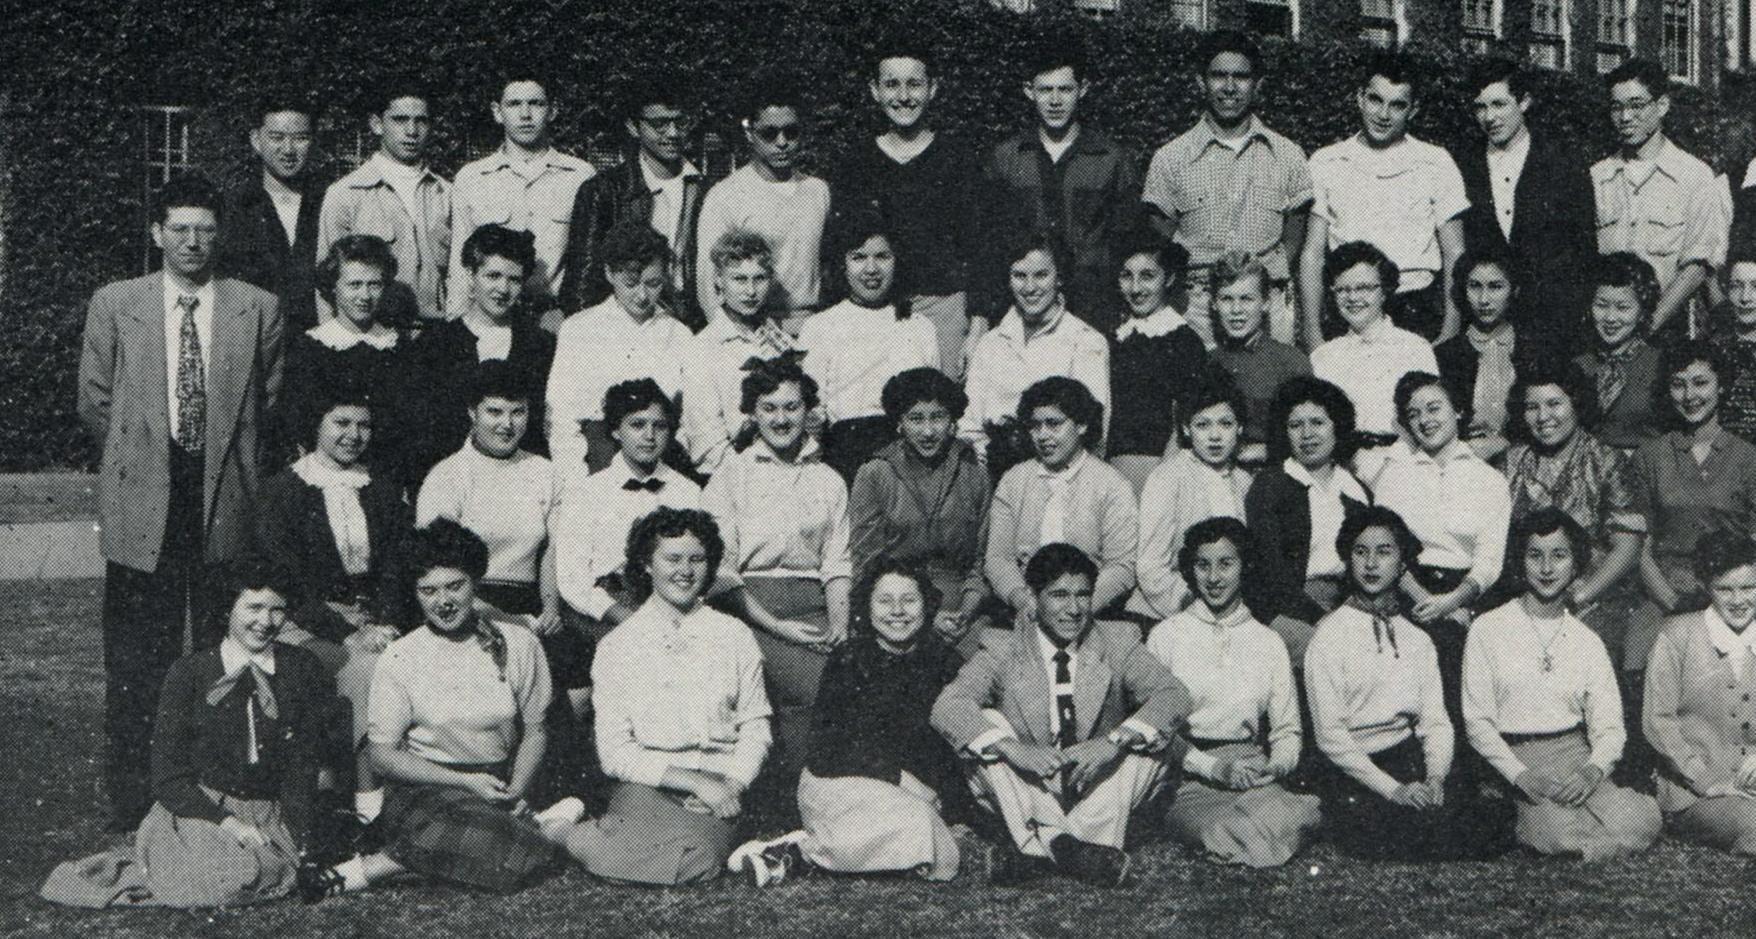 Garlans 1954